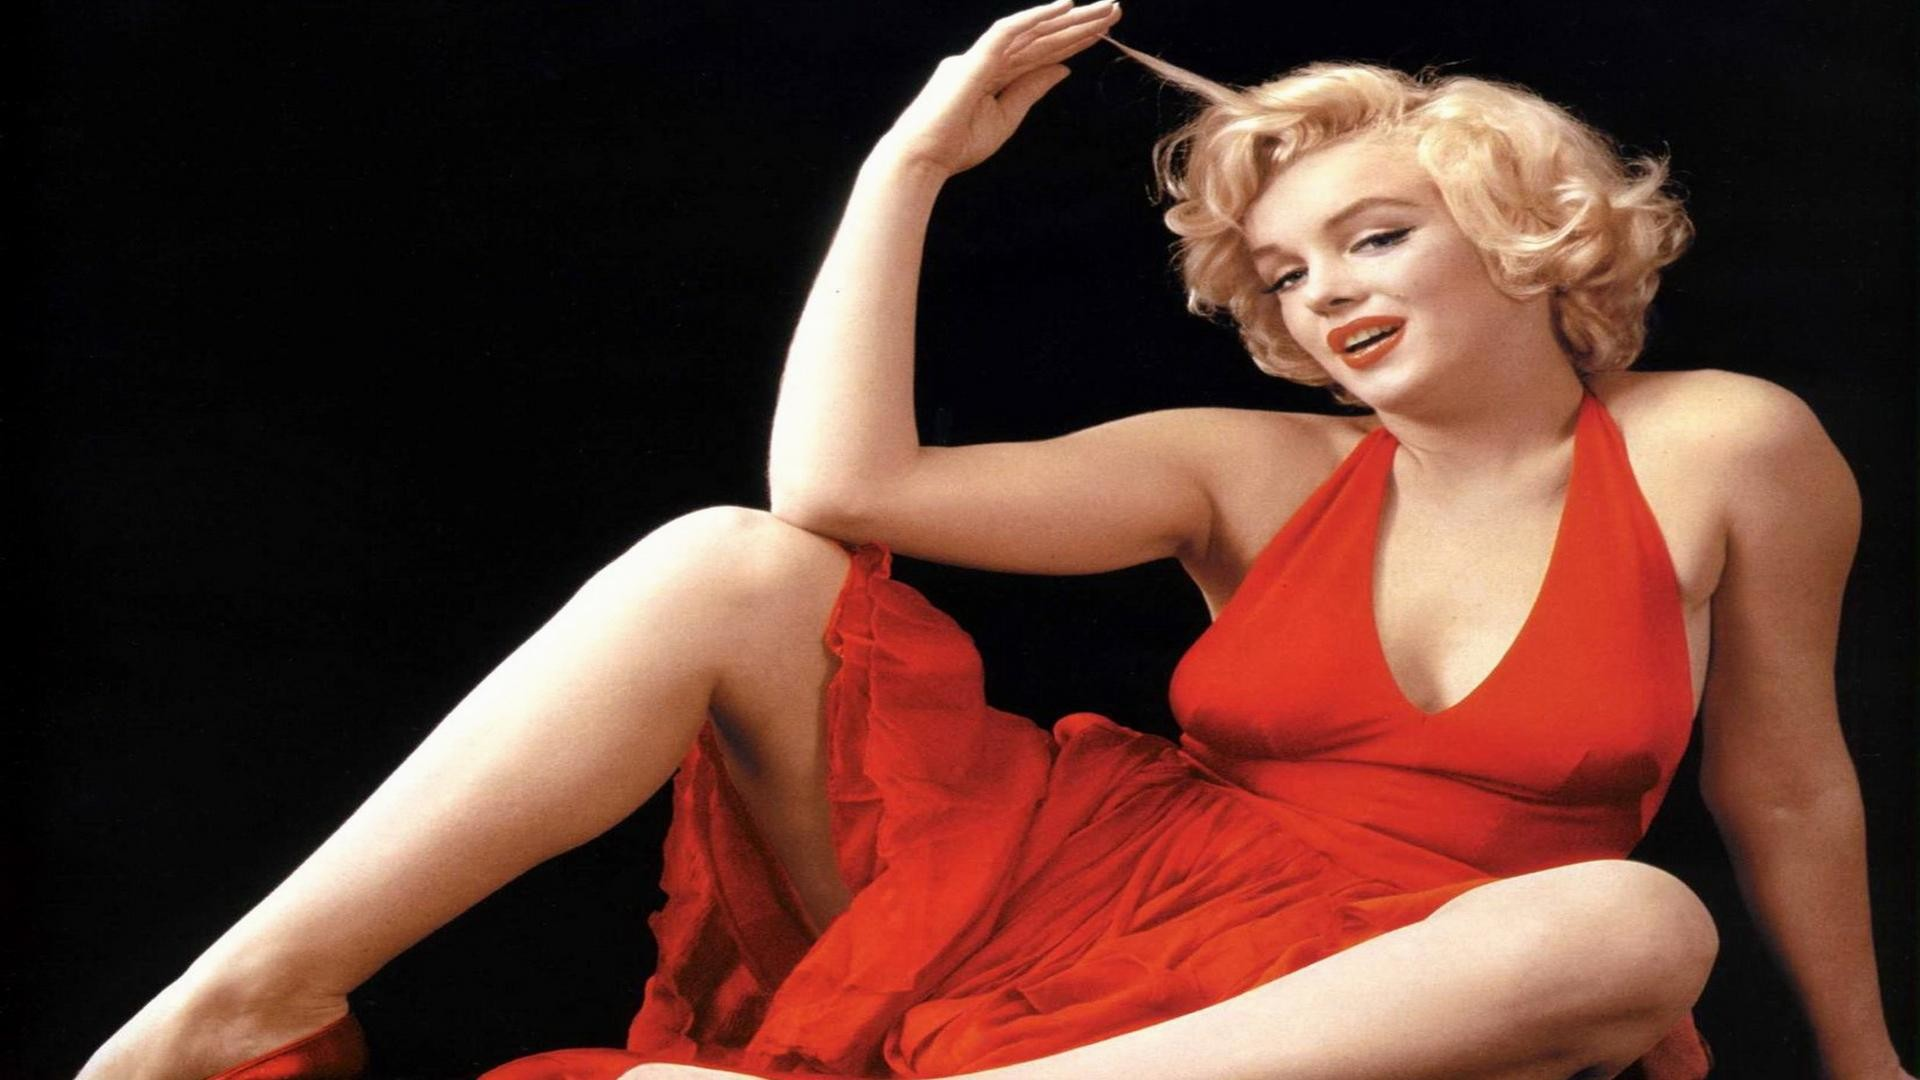 Marilyn Monroe Wallpapers Wallpaper 1920×1200 Marilyn Monroe Wallpaper (41  Wallpapers)   Adorable